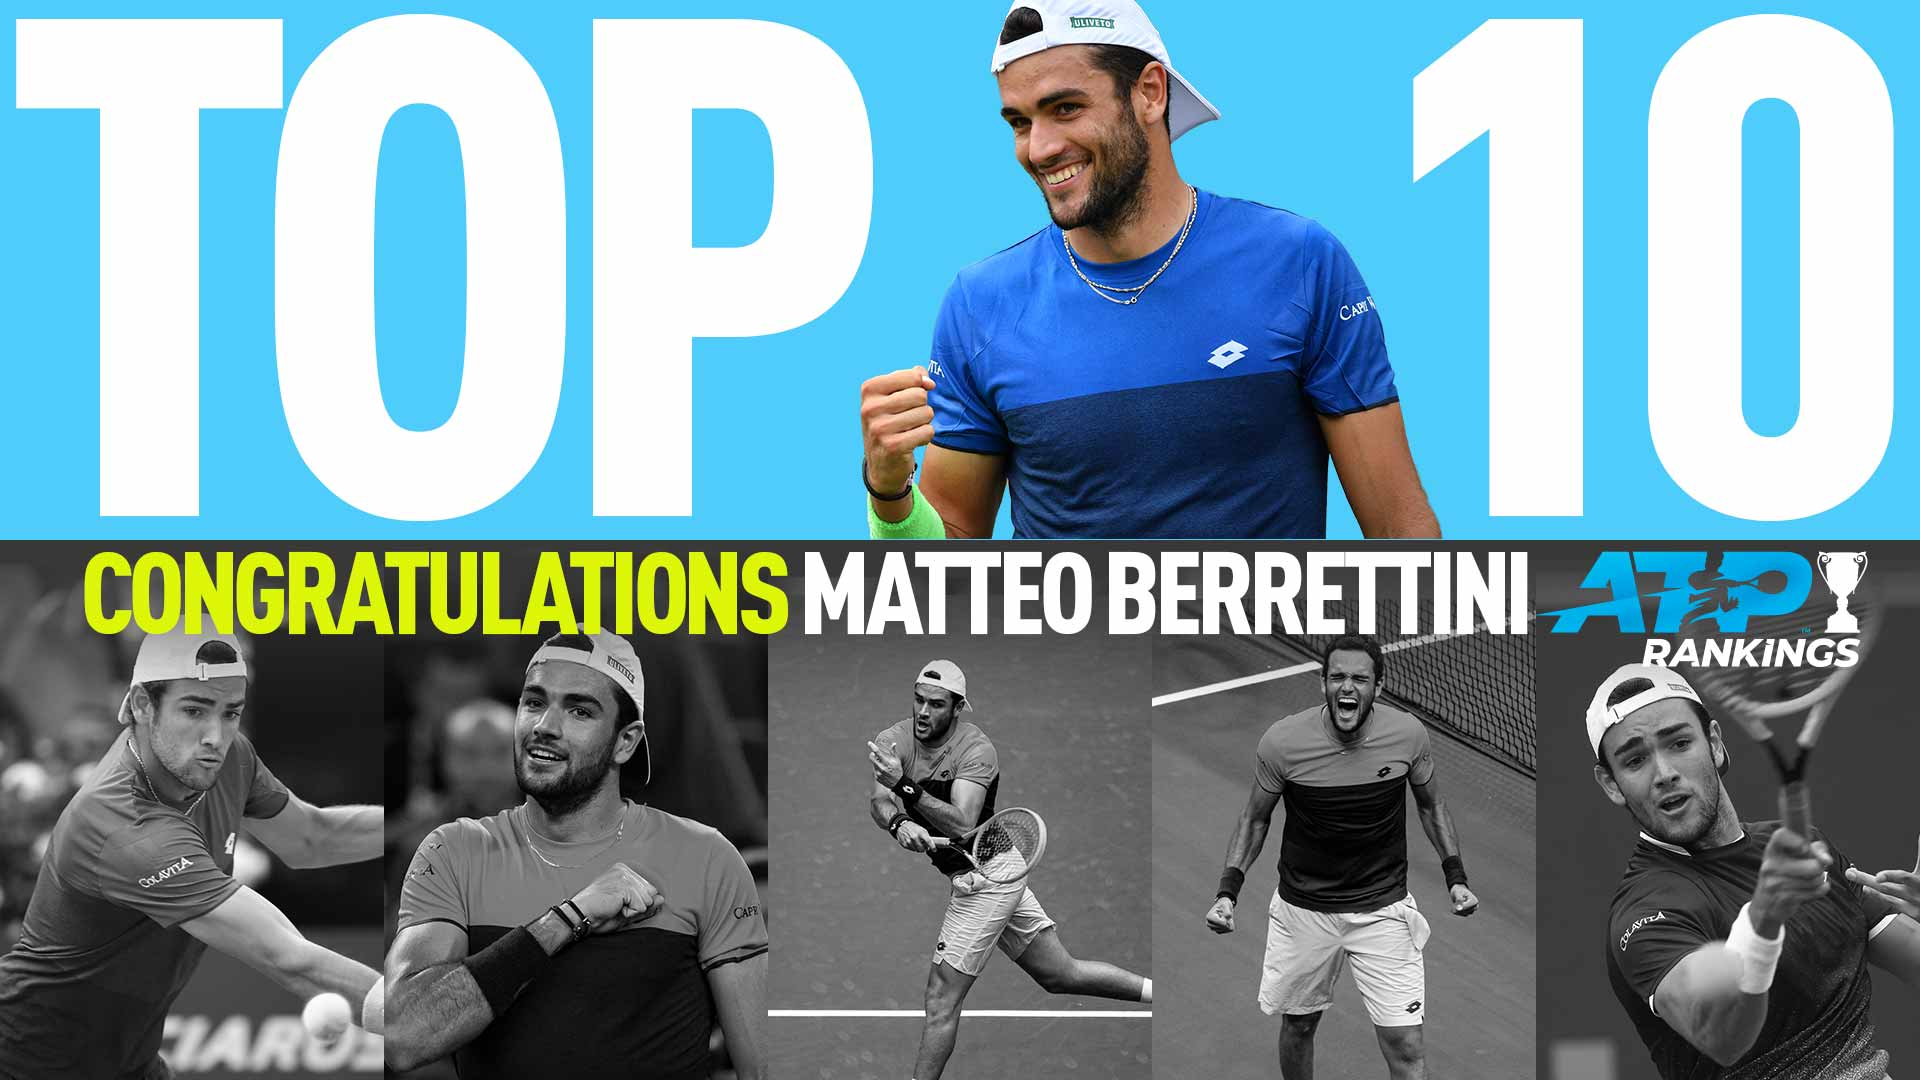 <a href='https://www.atptour.com/en/players/matteo-berrettini/bk40/overview'>Matteo Berrettini</a>